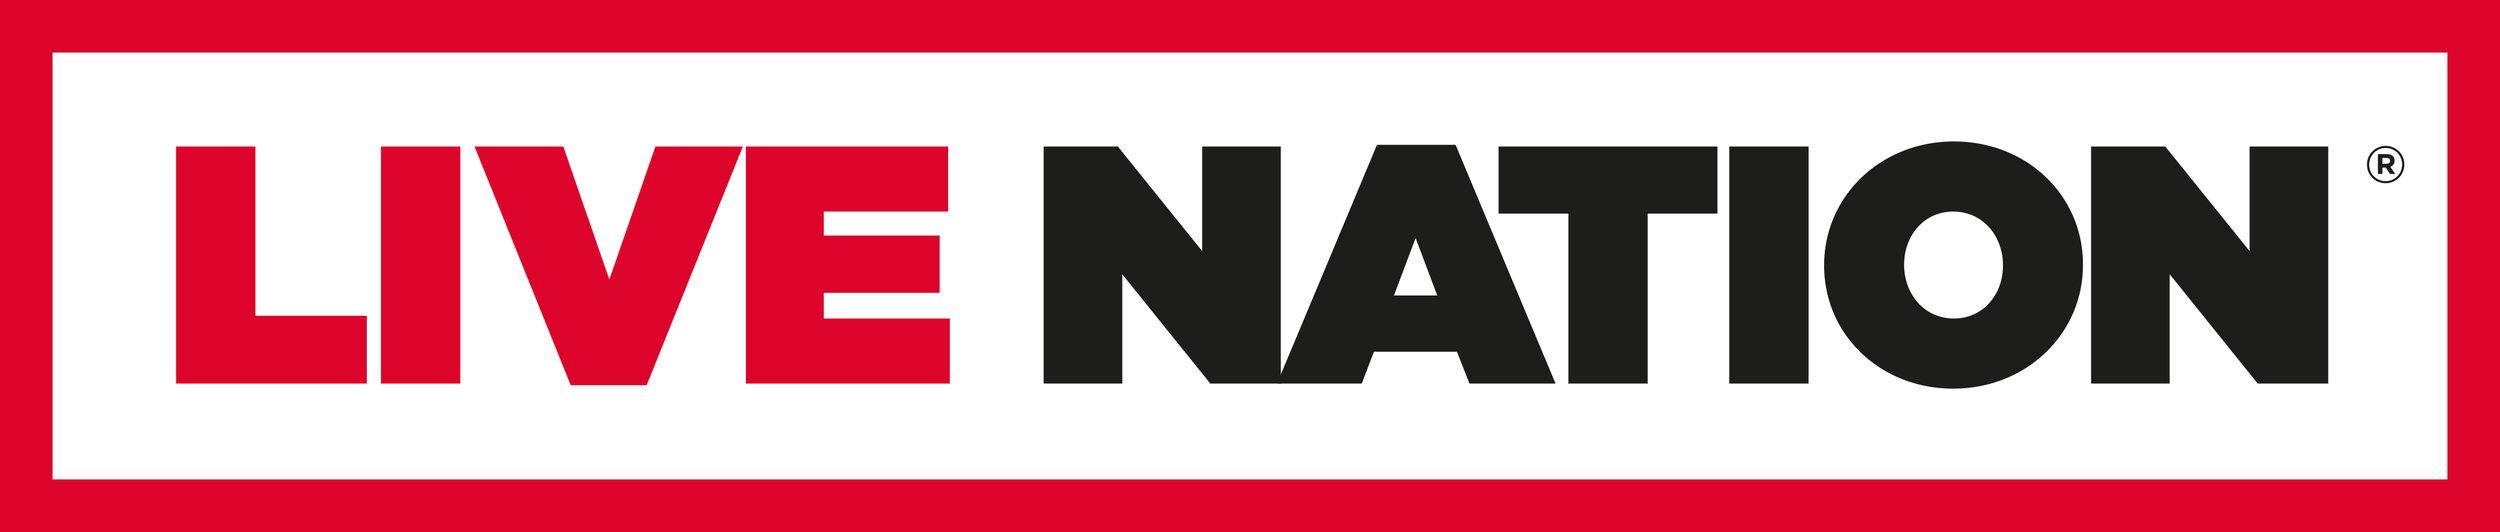 LiveNation_NEW2017_Logo_RedBorder_CMYK.jpg